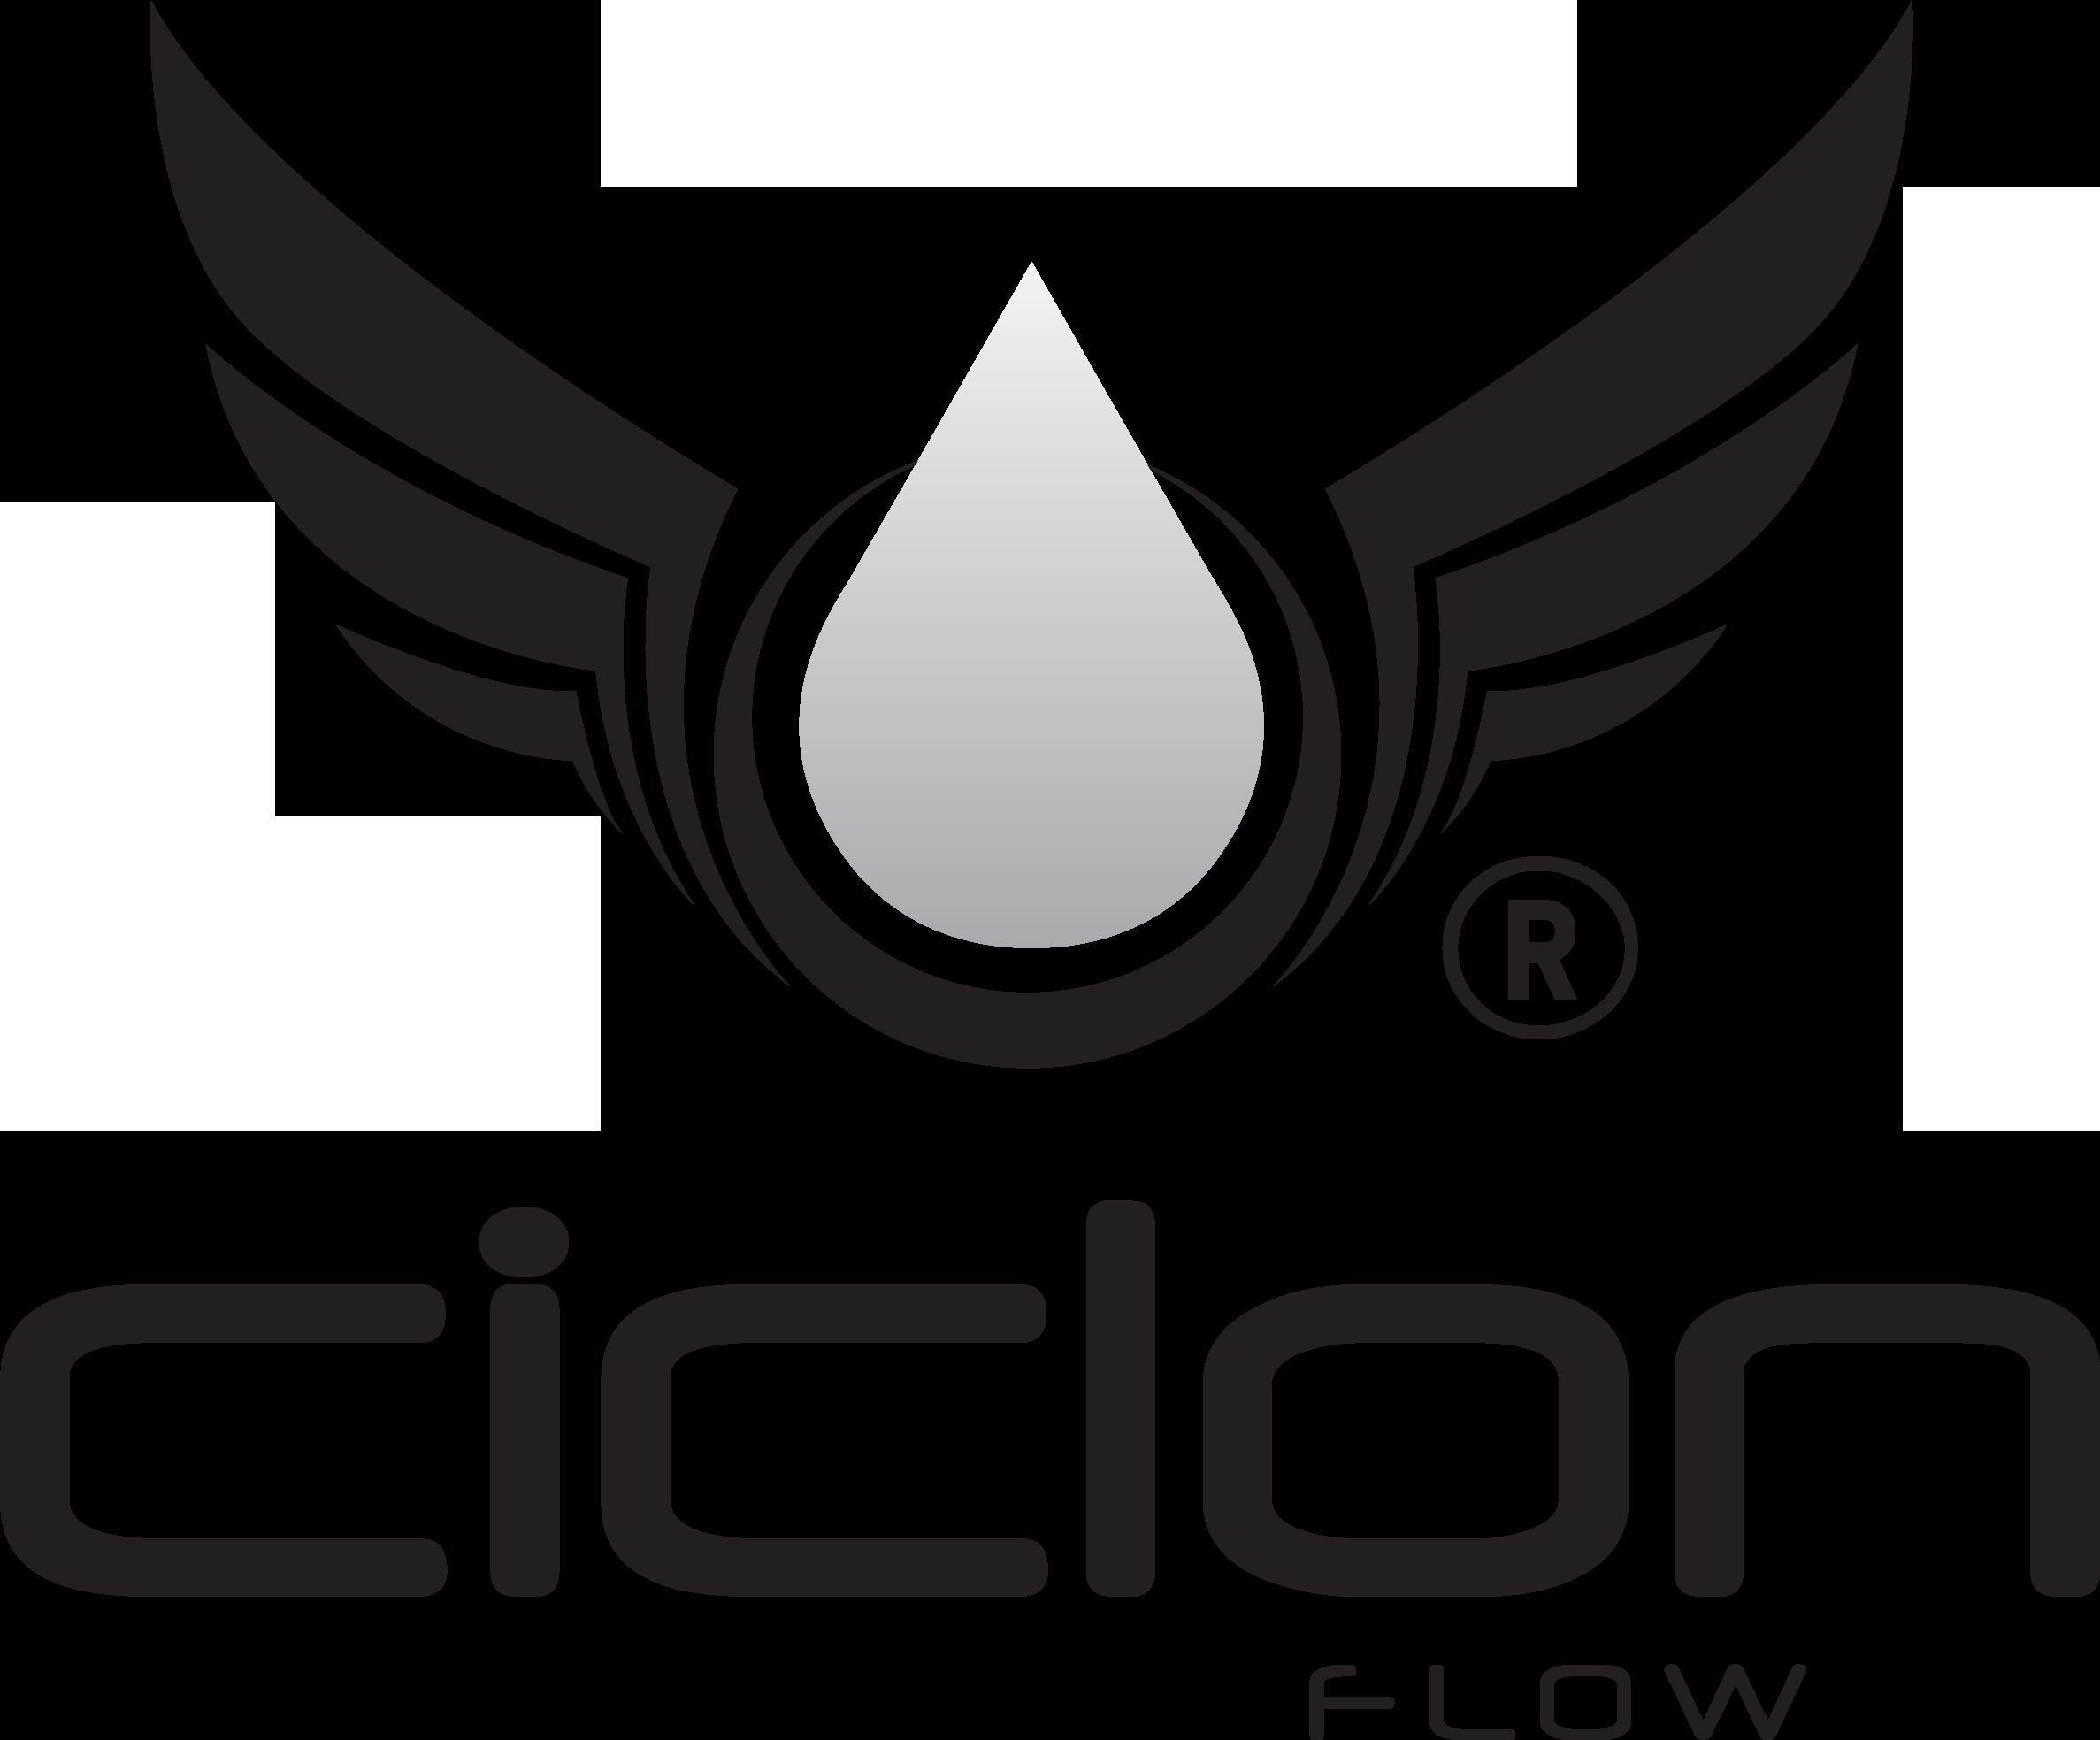 https://0201.nccdn.net/4_2/000/000/06b/a1b/LOGO-CICLON-02.png